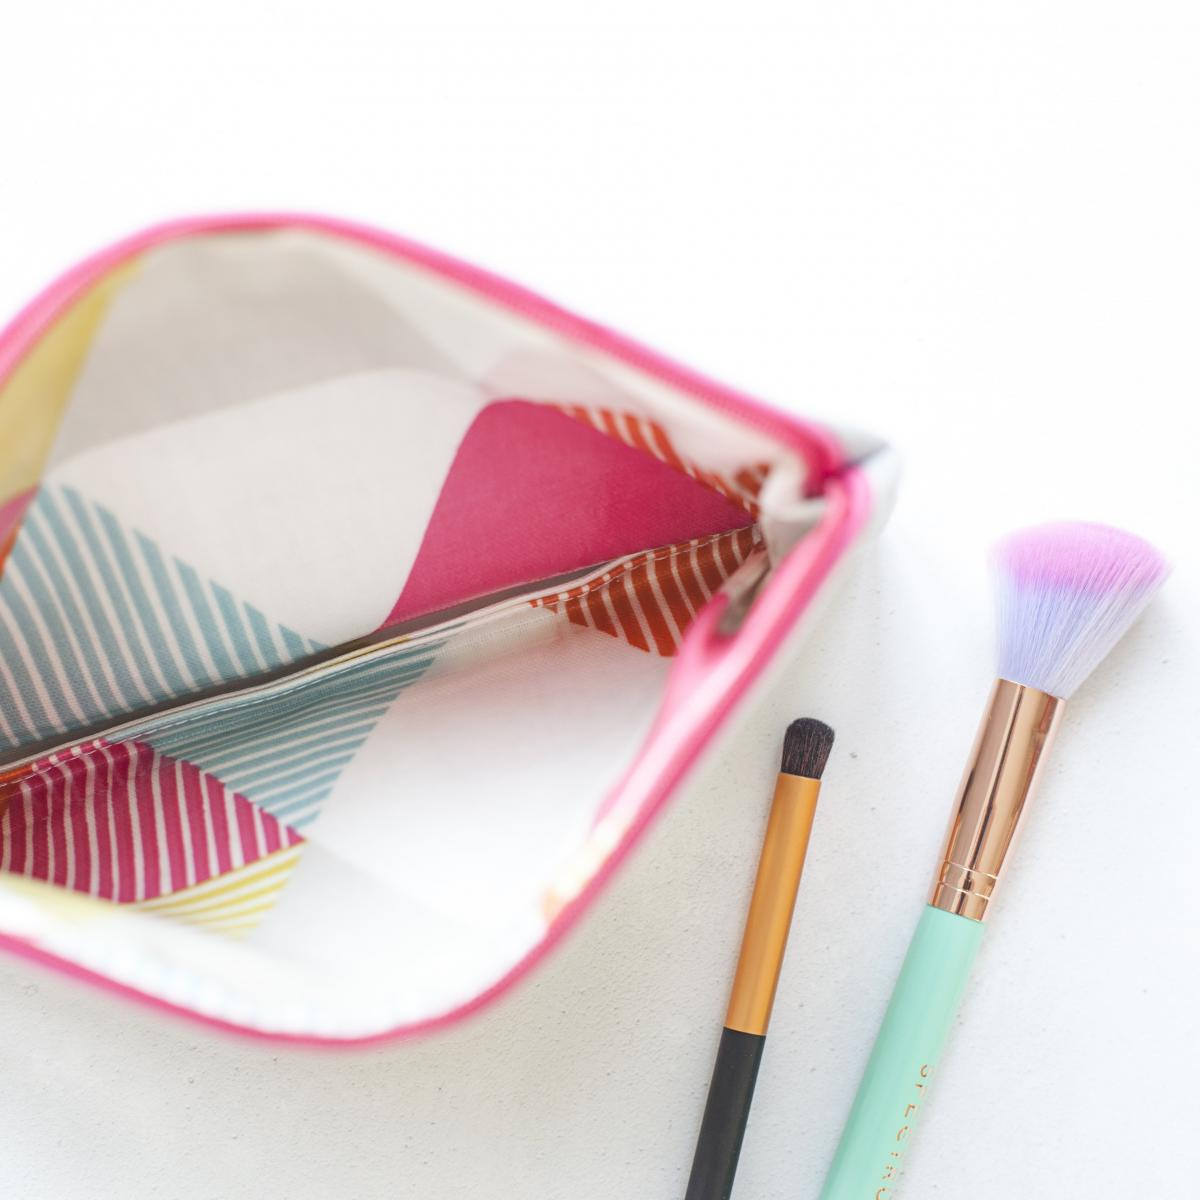 Paintbrush Brush Applicator